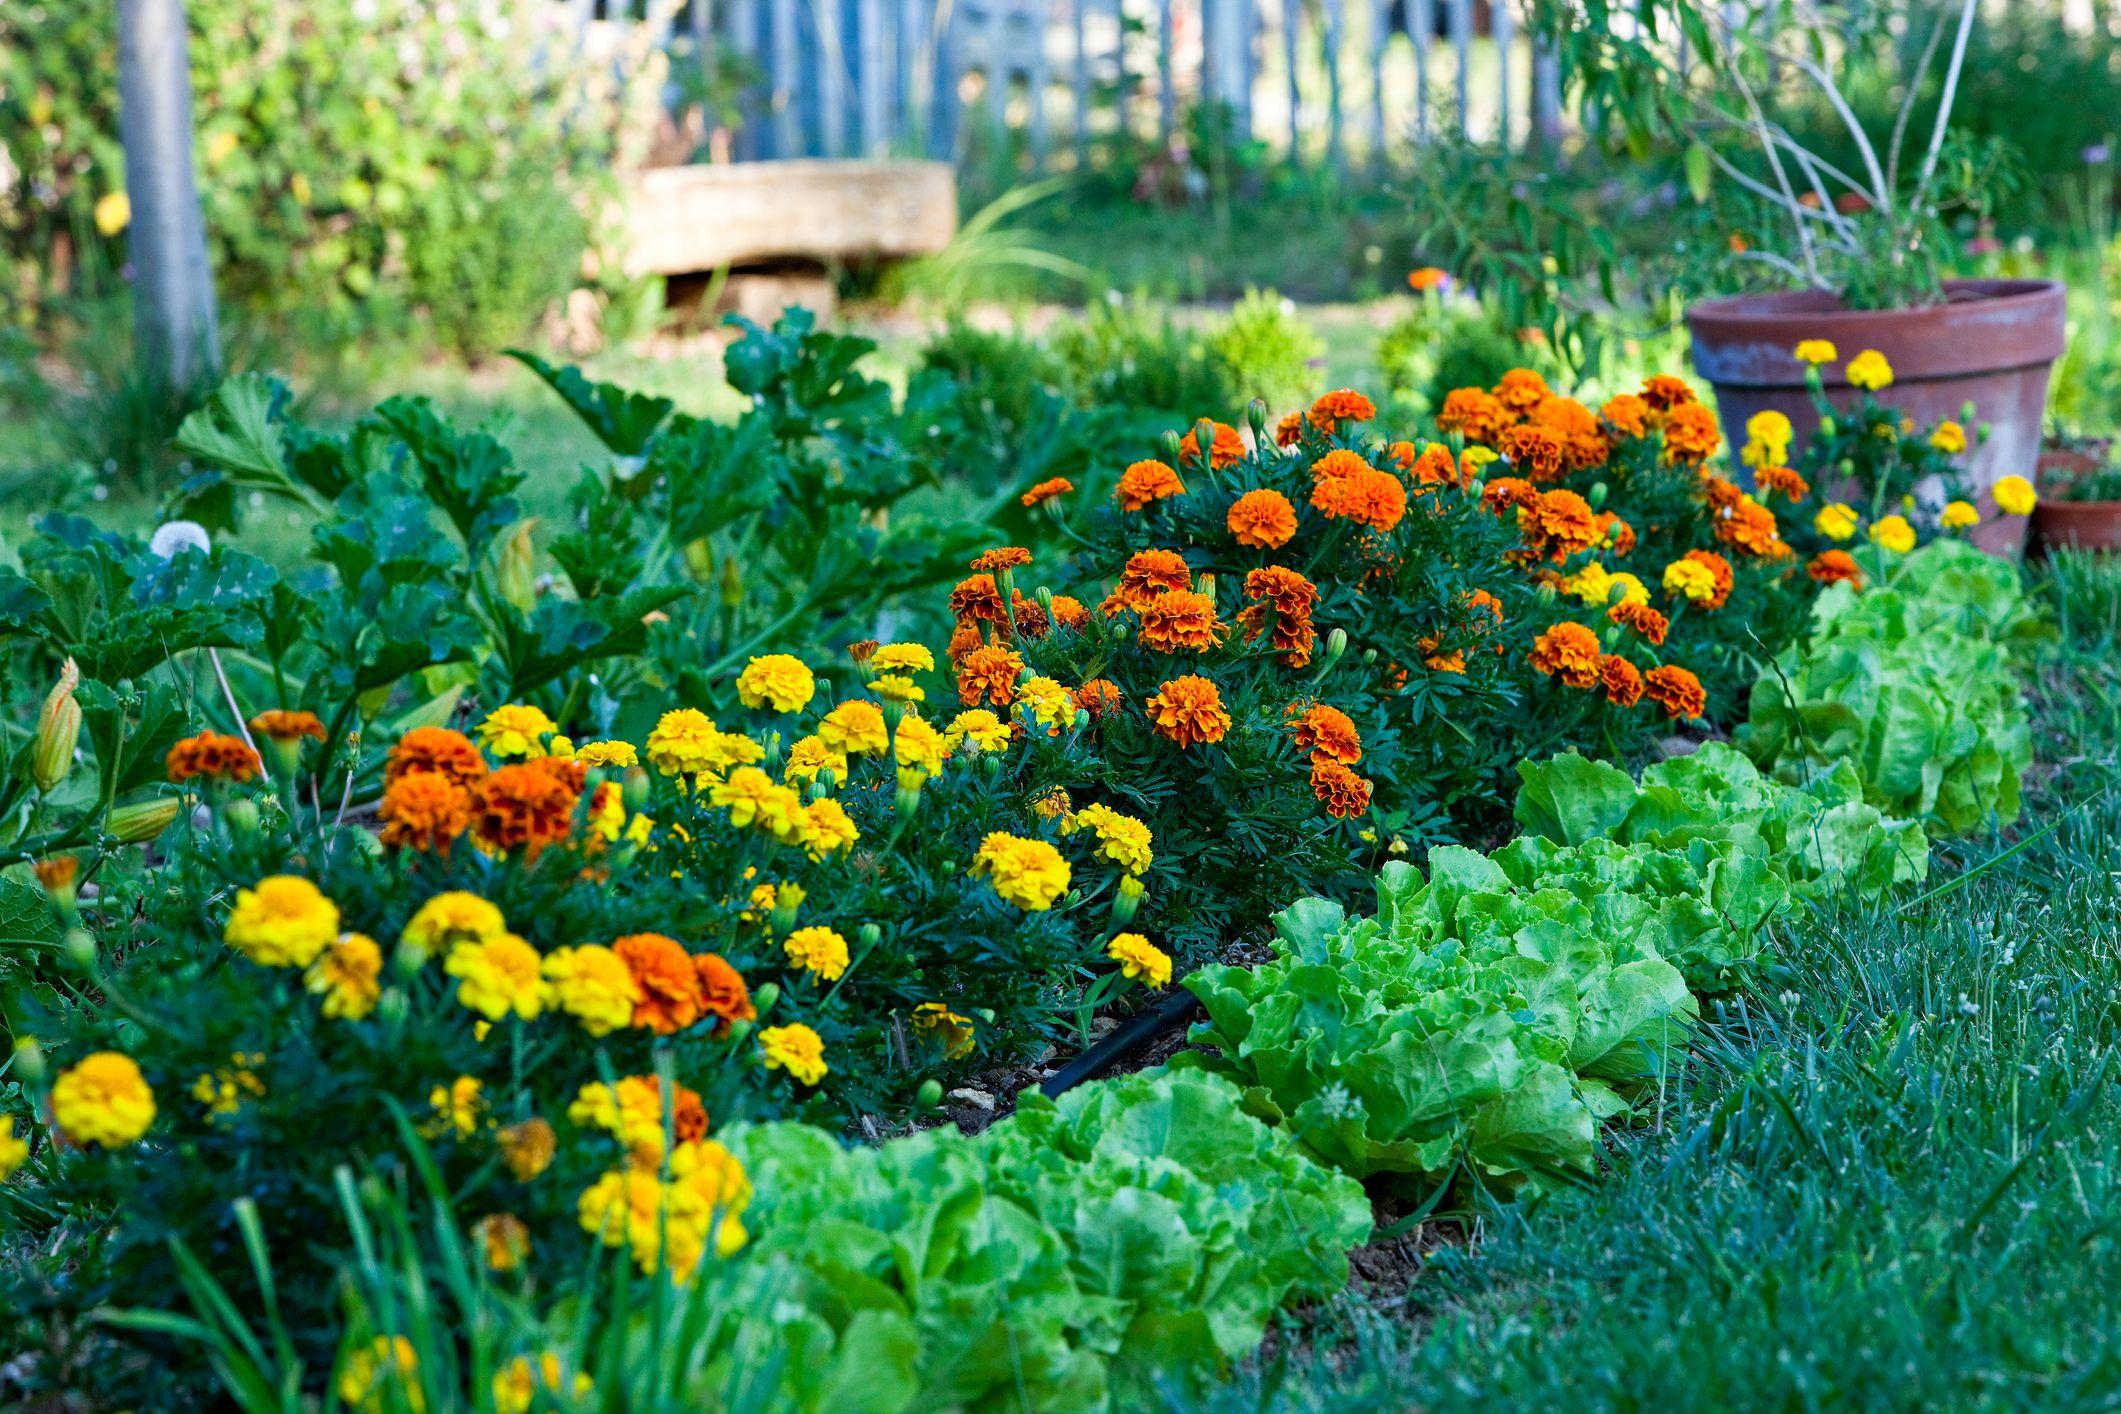 Organic gardening - cover